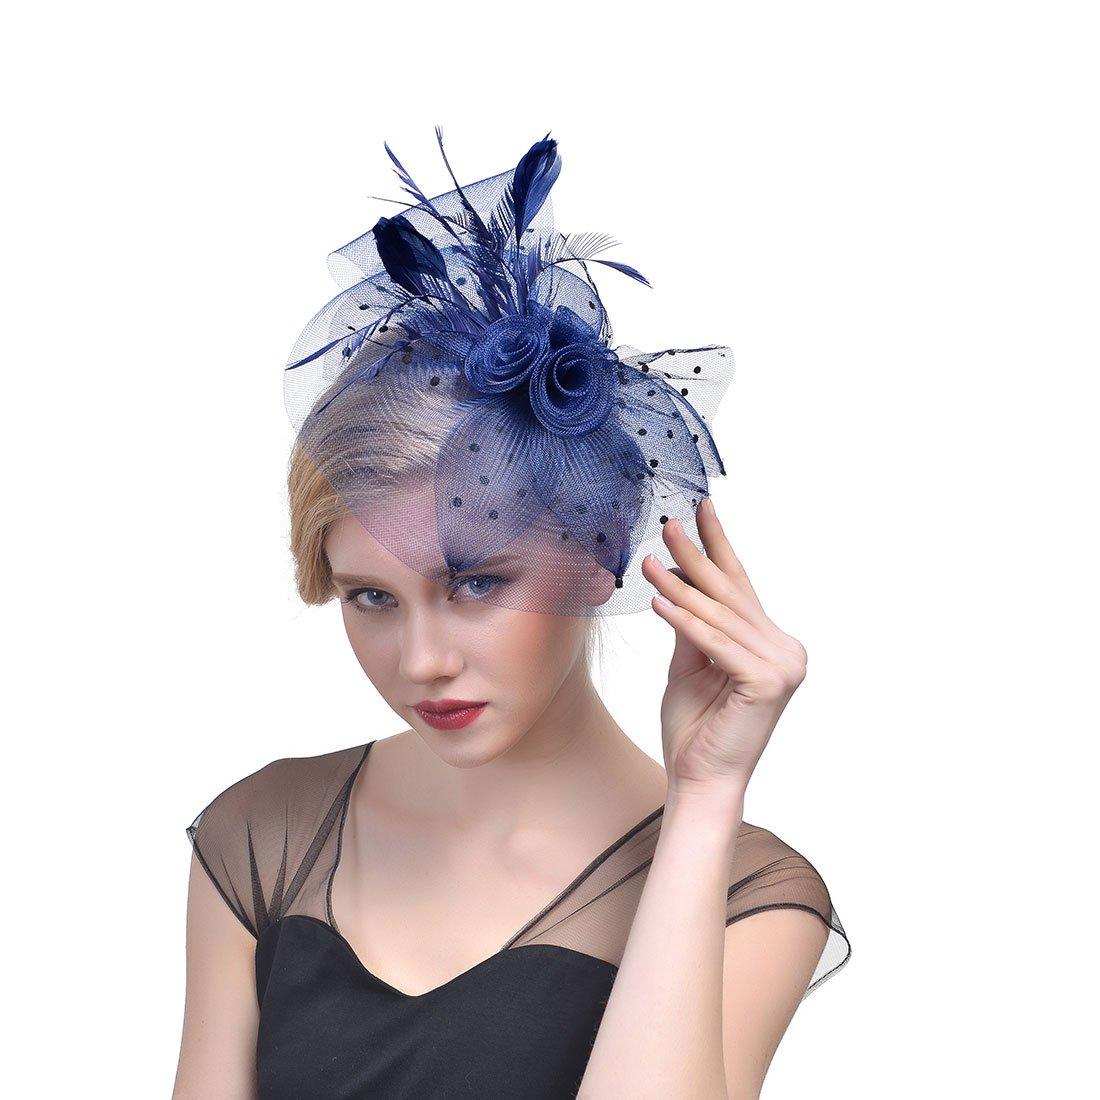 dressfan elegante flor lunares malla circular velo neto pluma Fascinator pinza de pelo diadema sombrero c/óctel de la boda